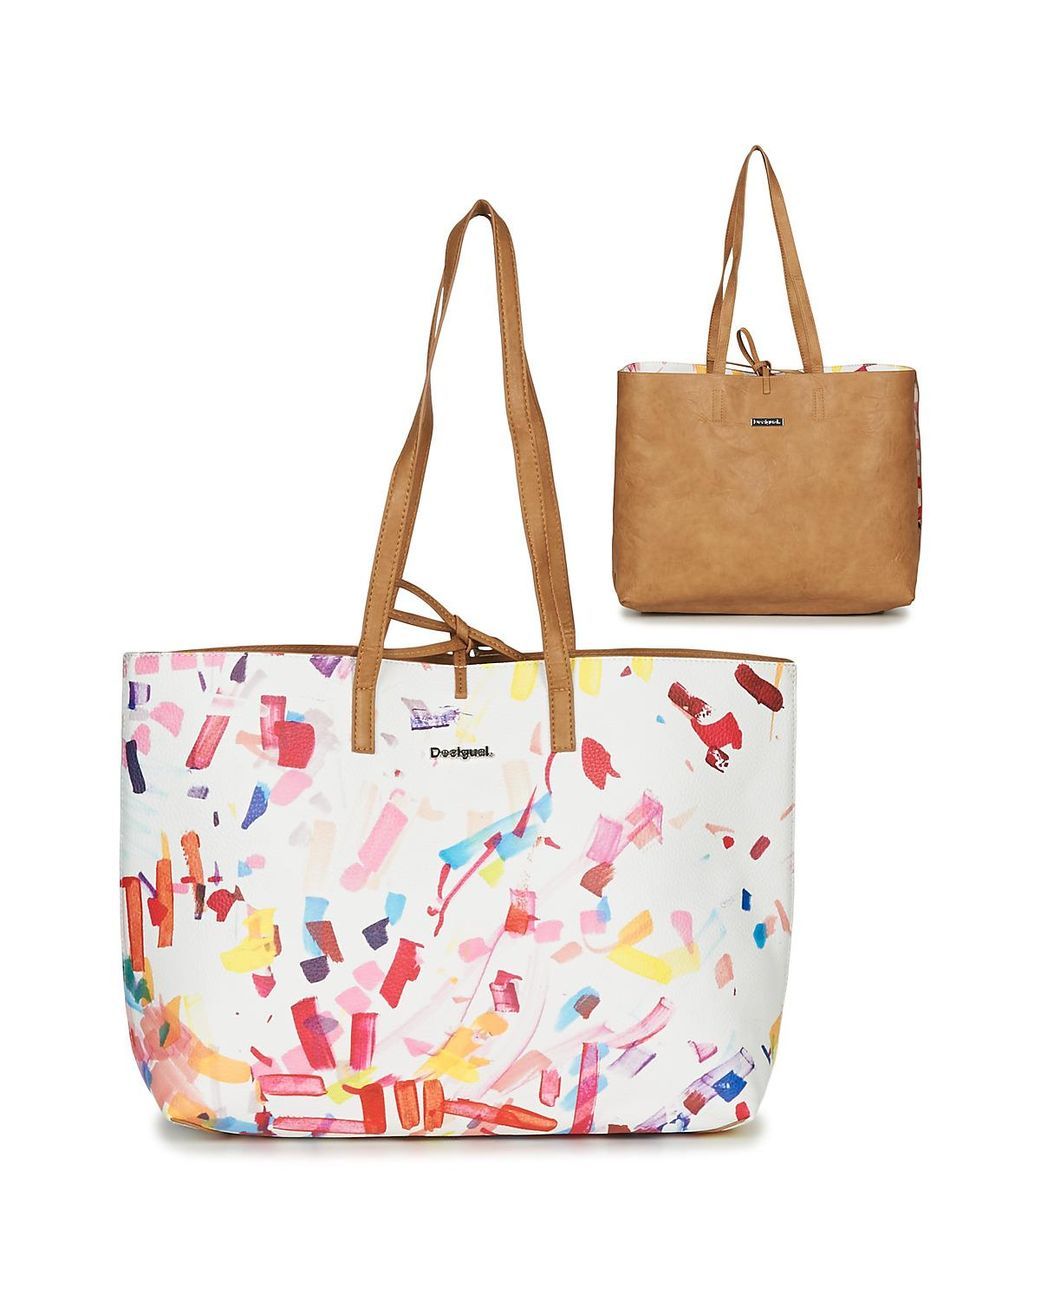 Desigual Women/'s White Confetti Seattle 3 in 1 Bag  Cross Body Shopper RRP£74